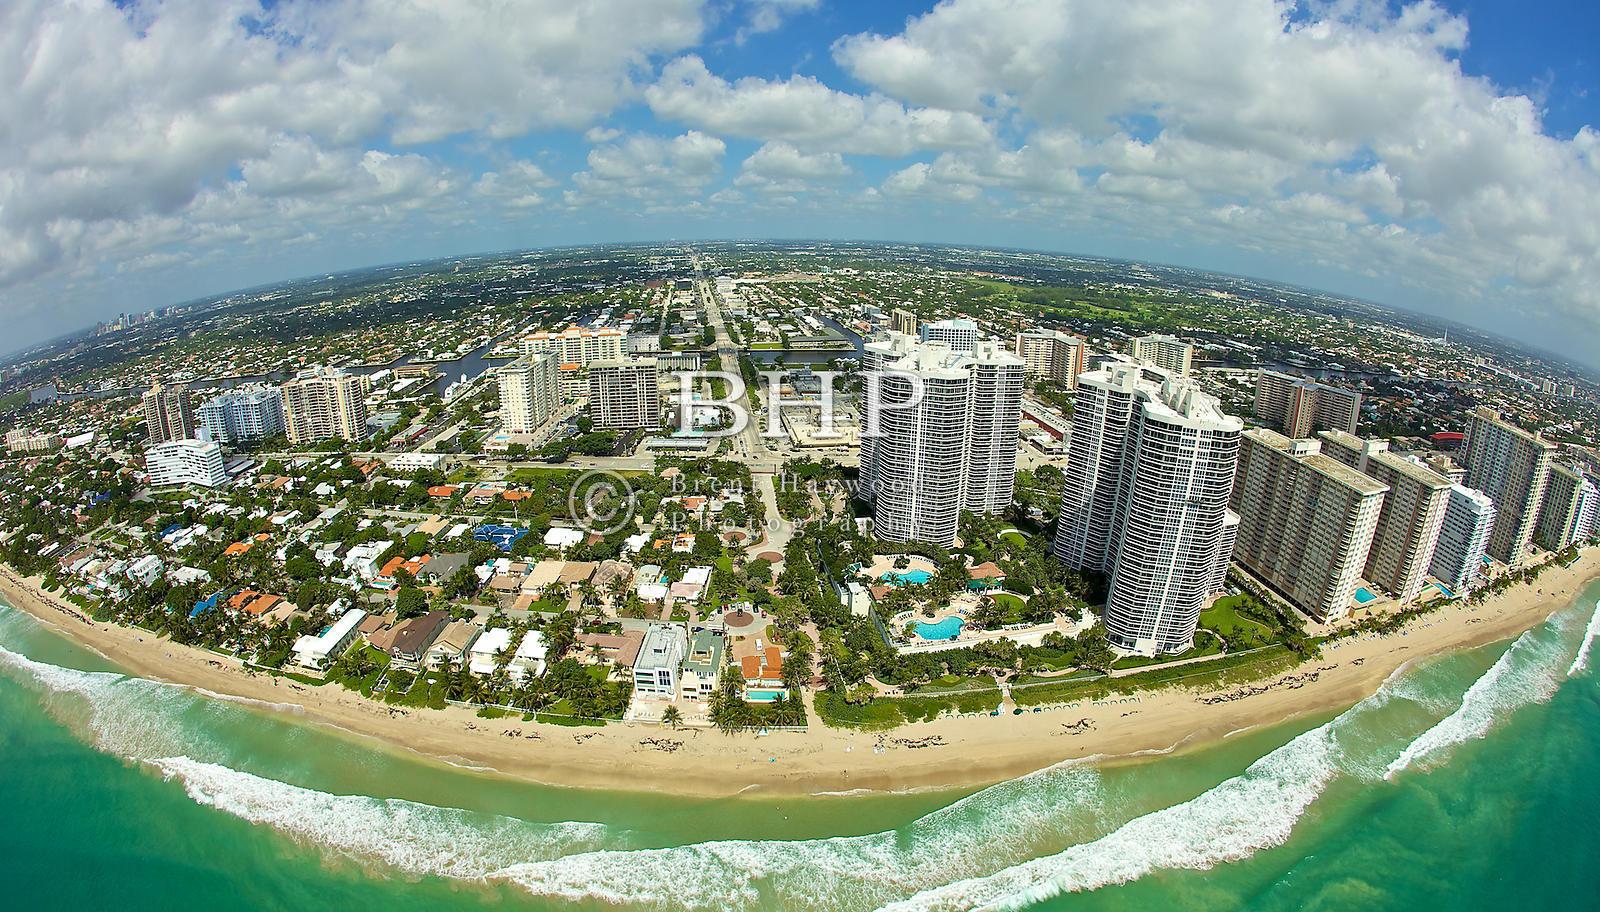 Brent Florida Hotels